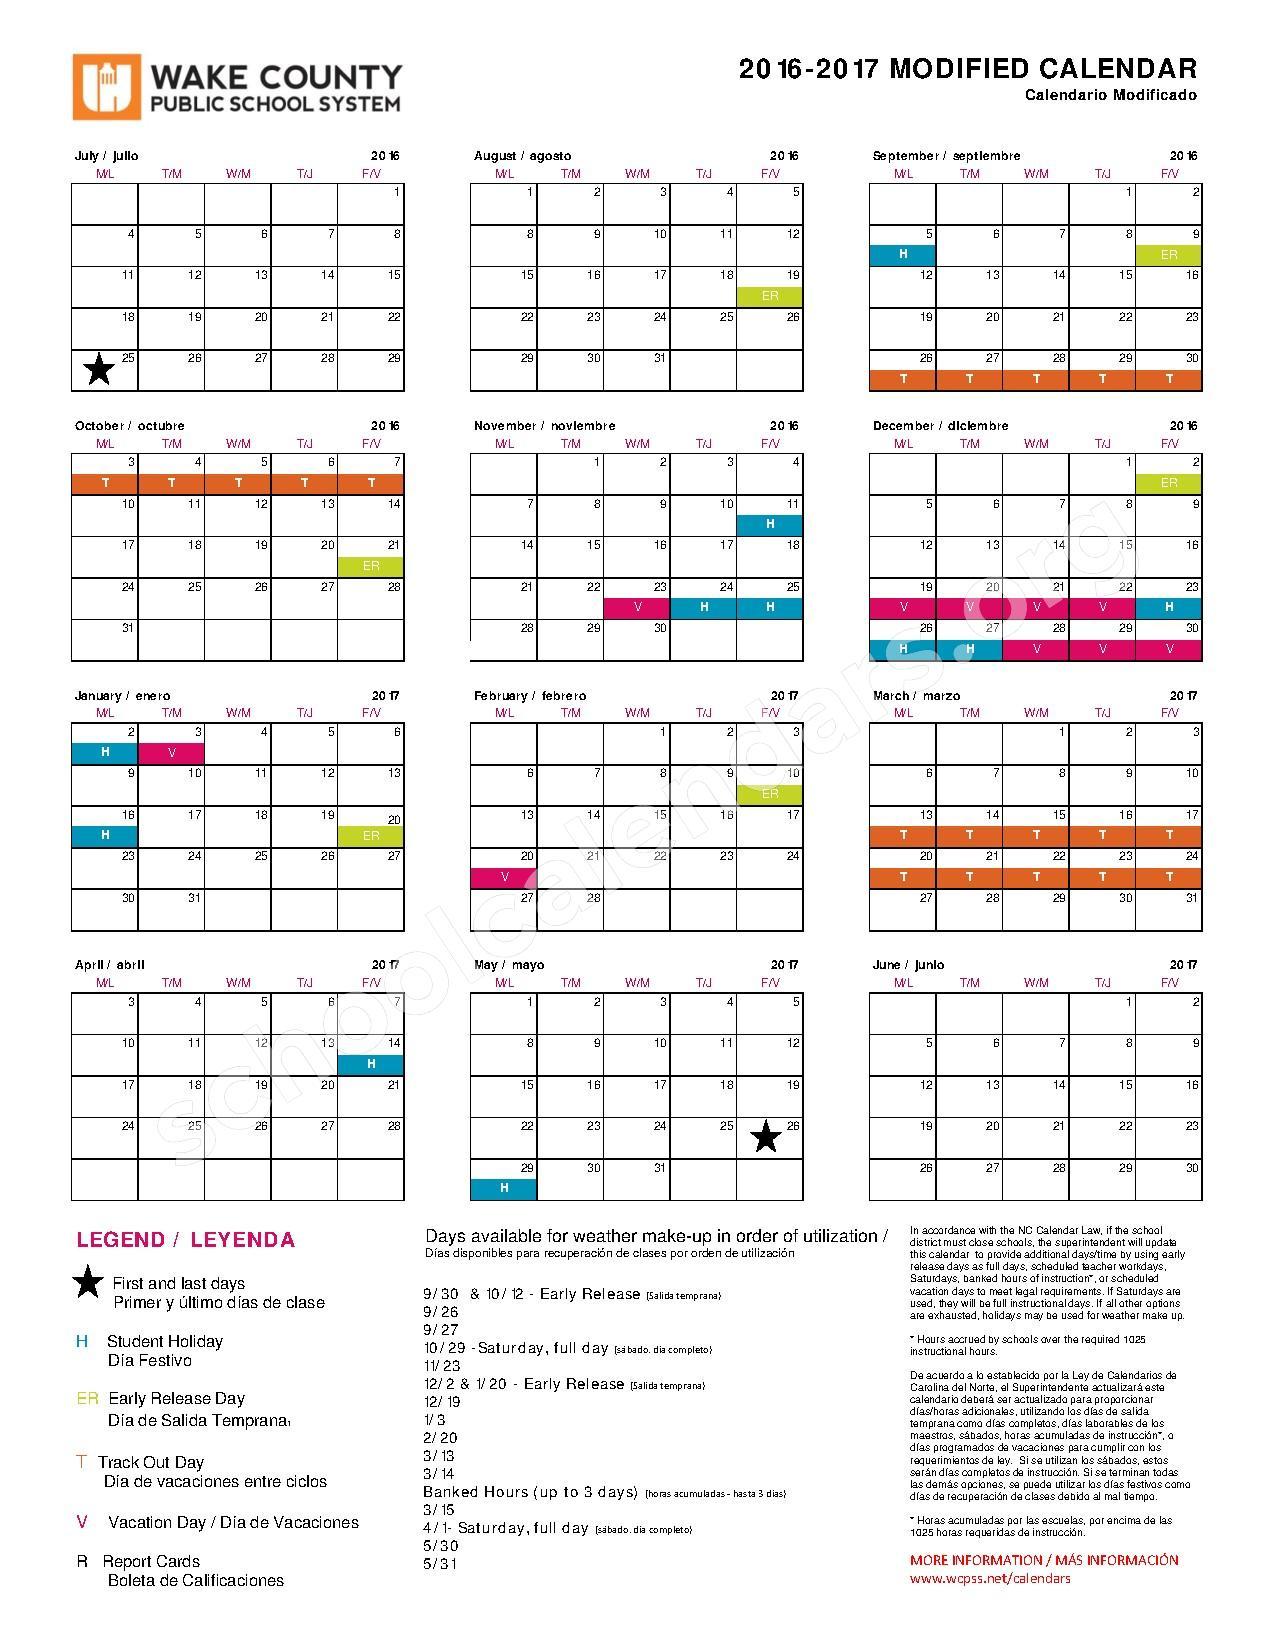 Davis County School Calendar.2016 2017 Modified Calendar Wake County Public School System